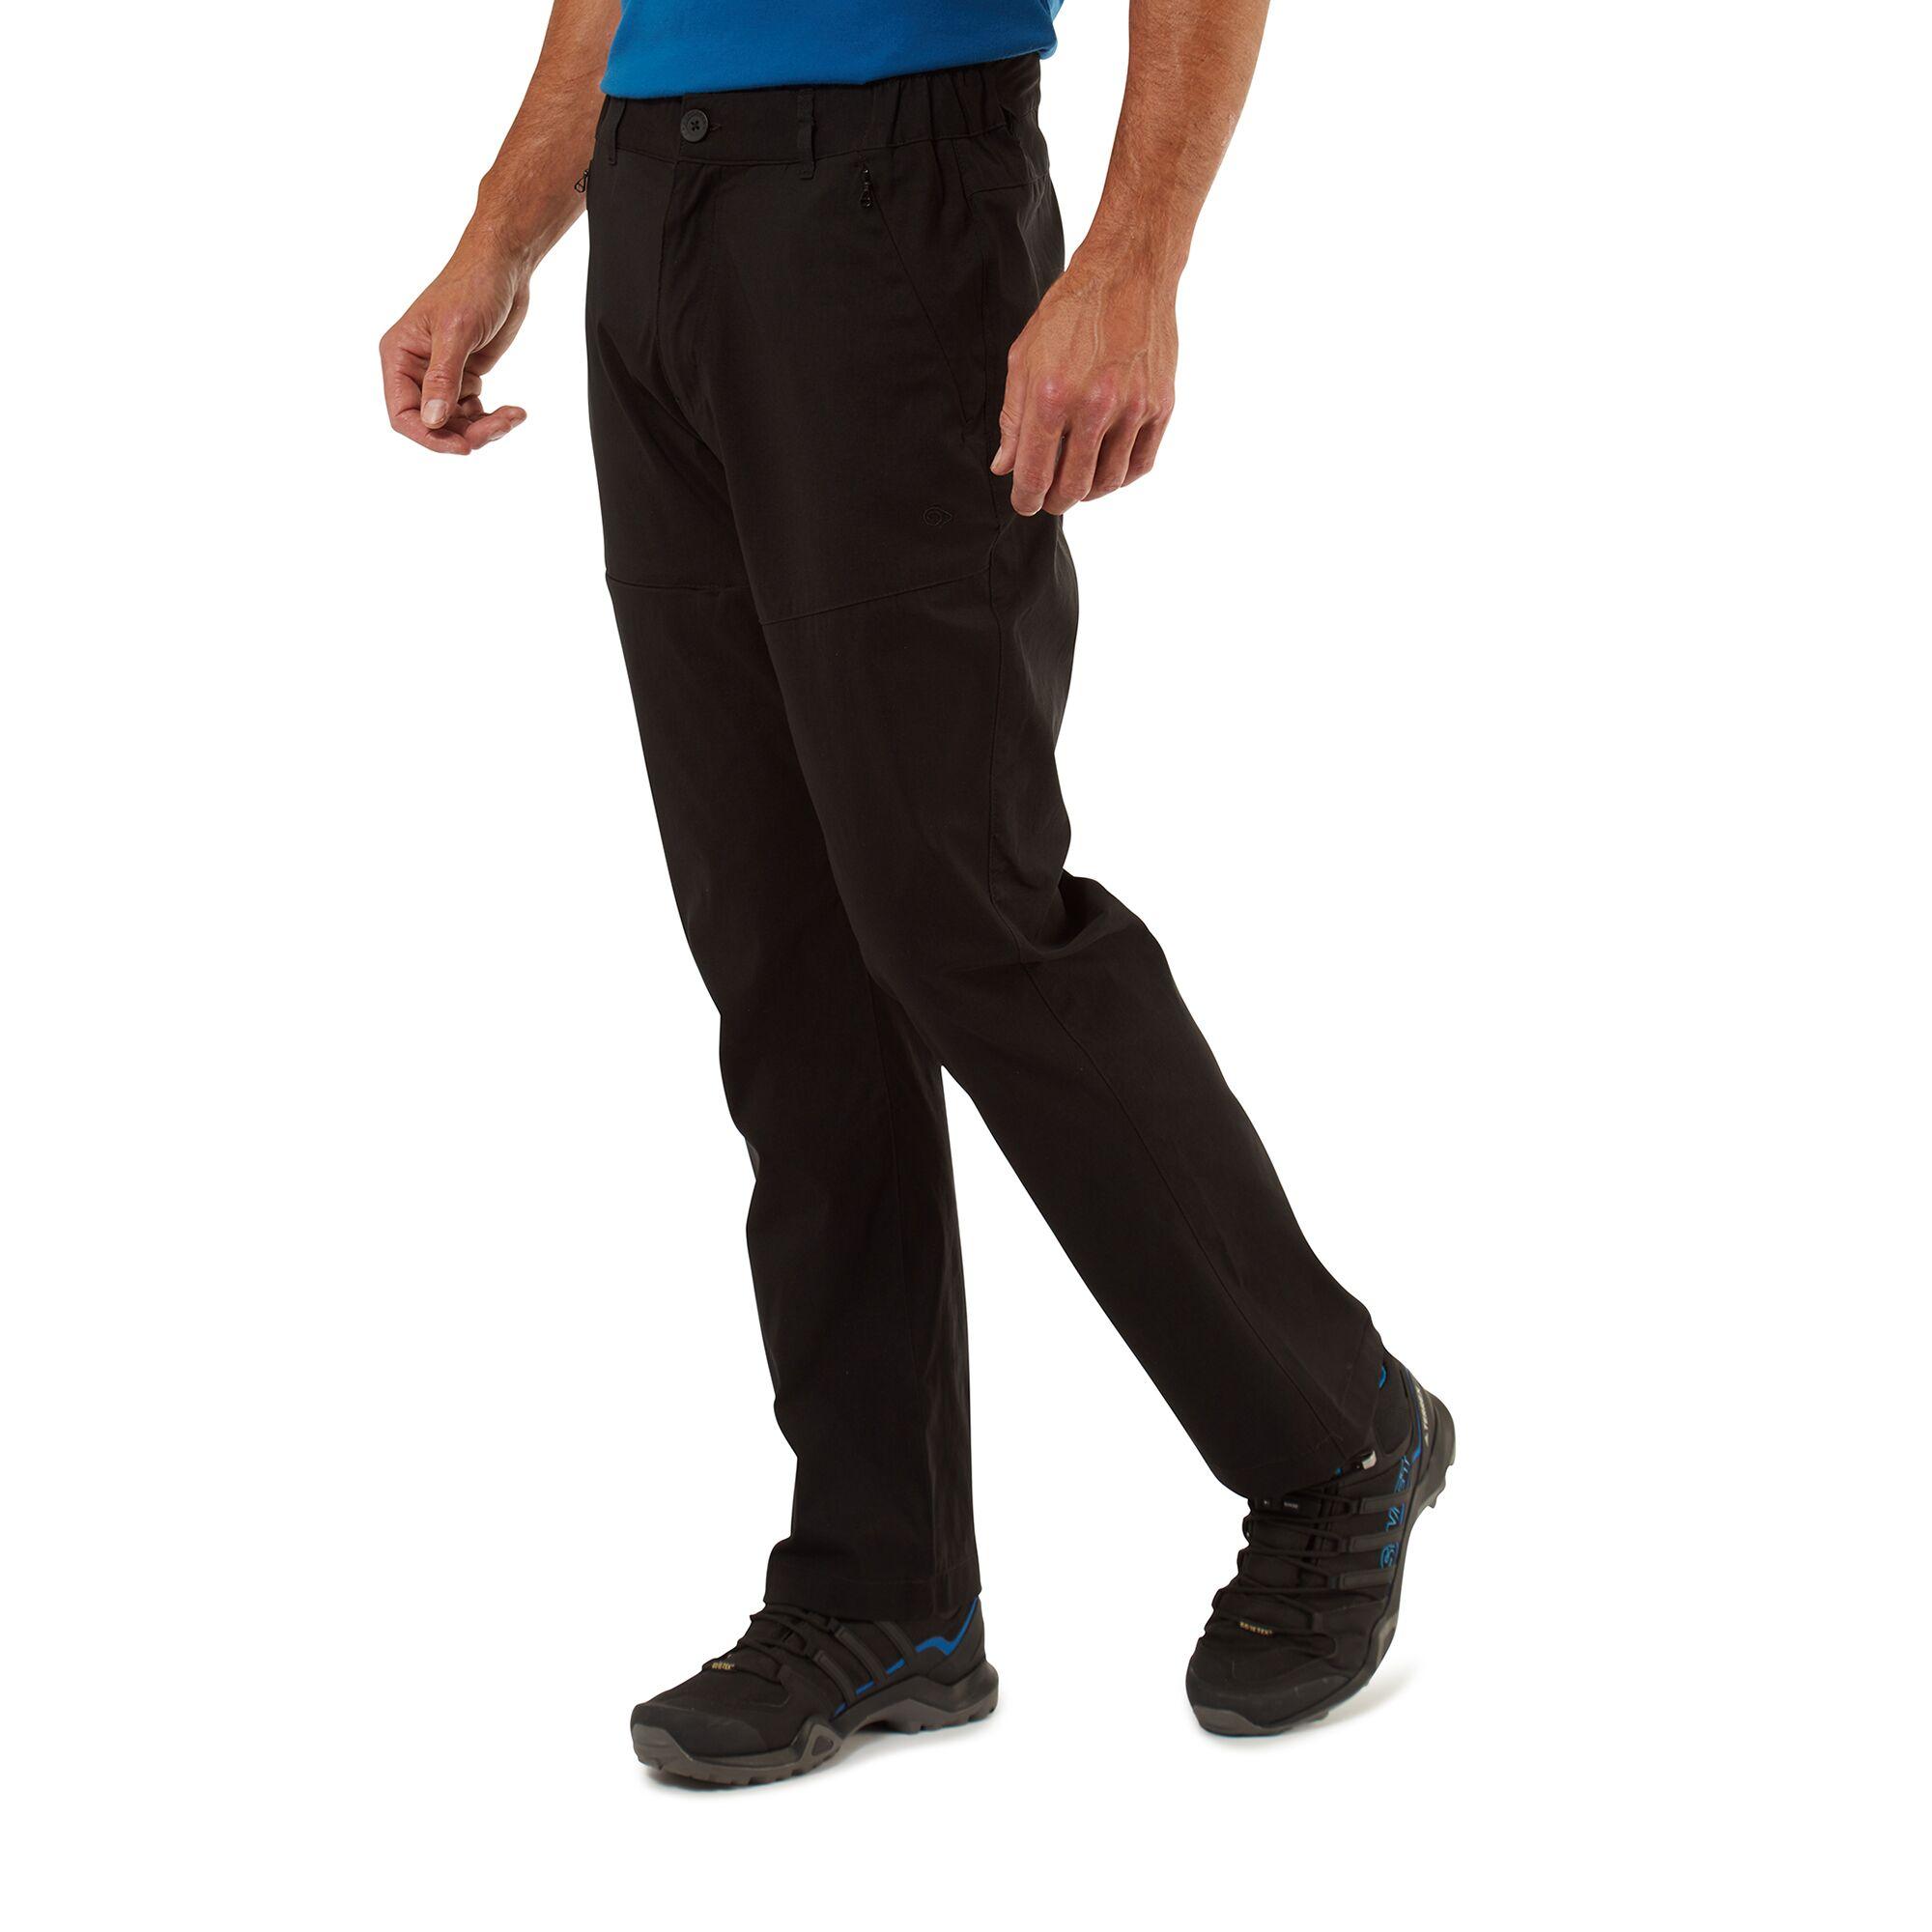 Craghoppers Mens Classic Kiwi Trousers - Bark - 34s